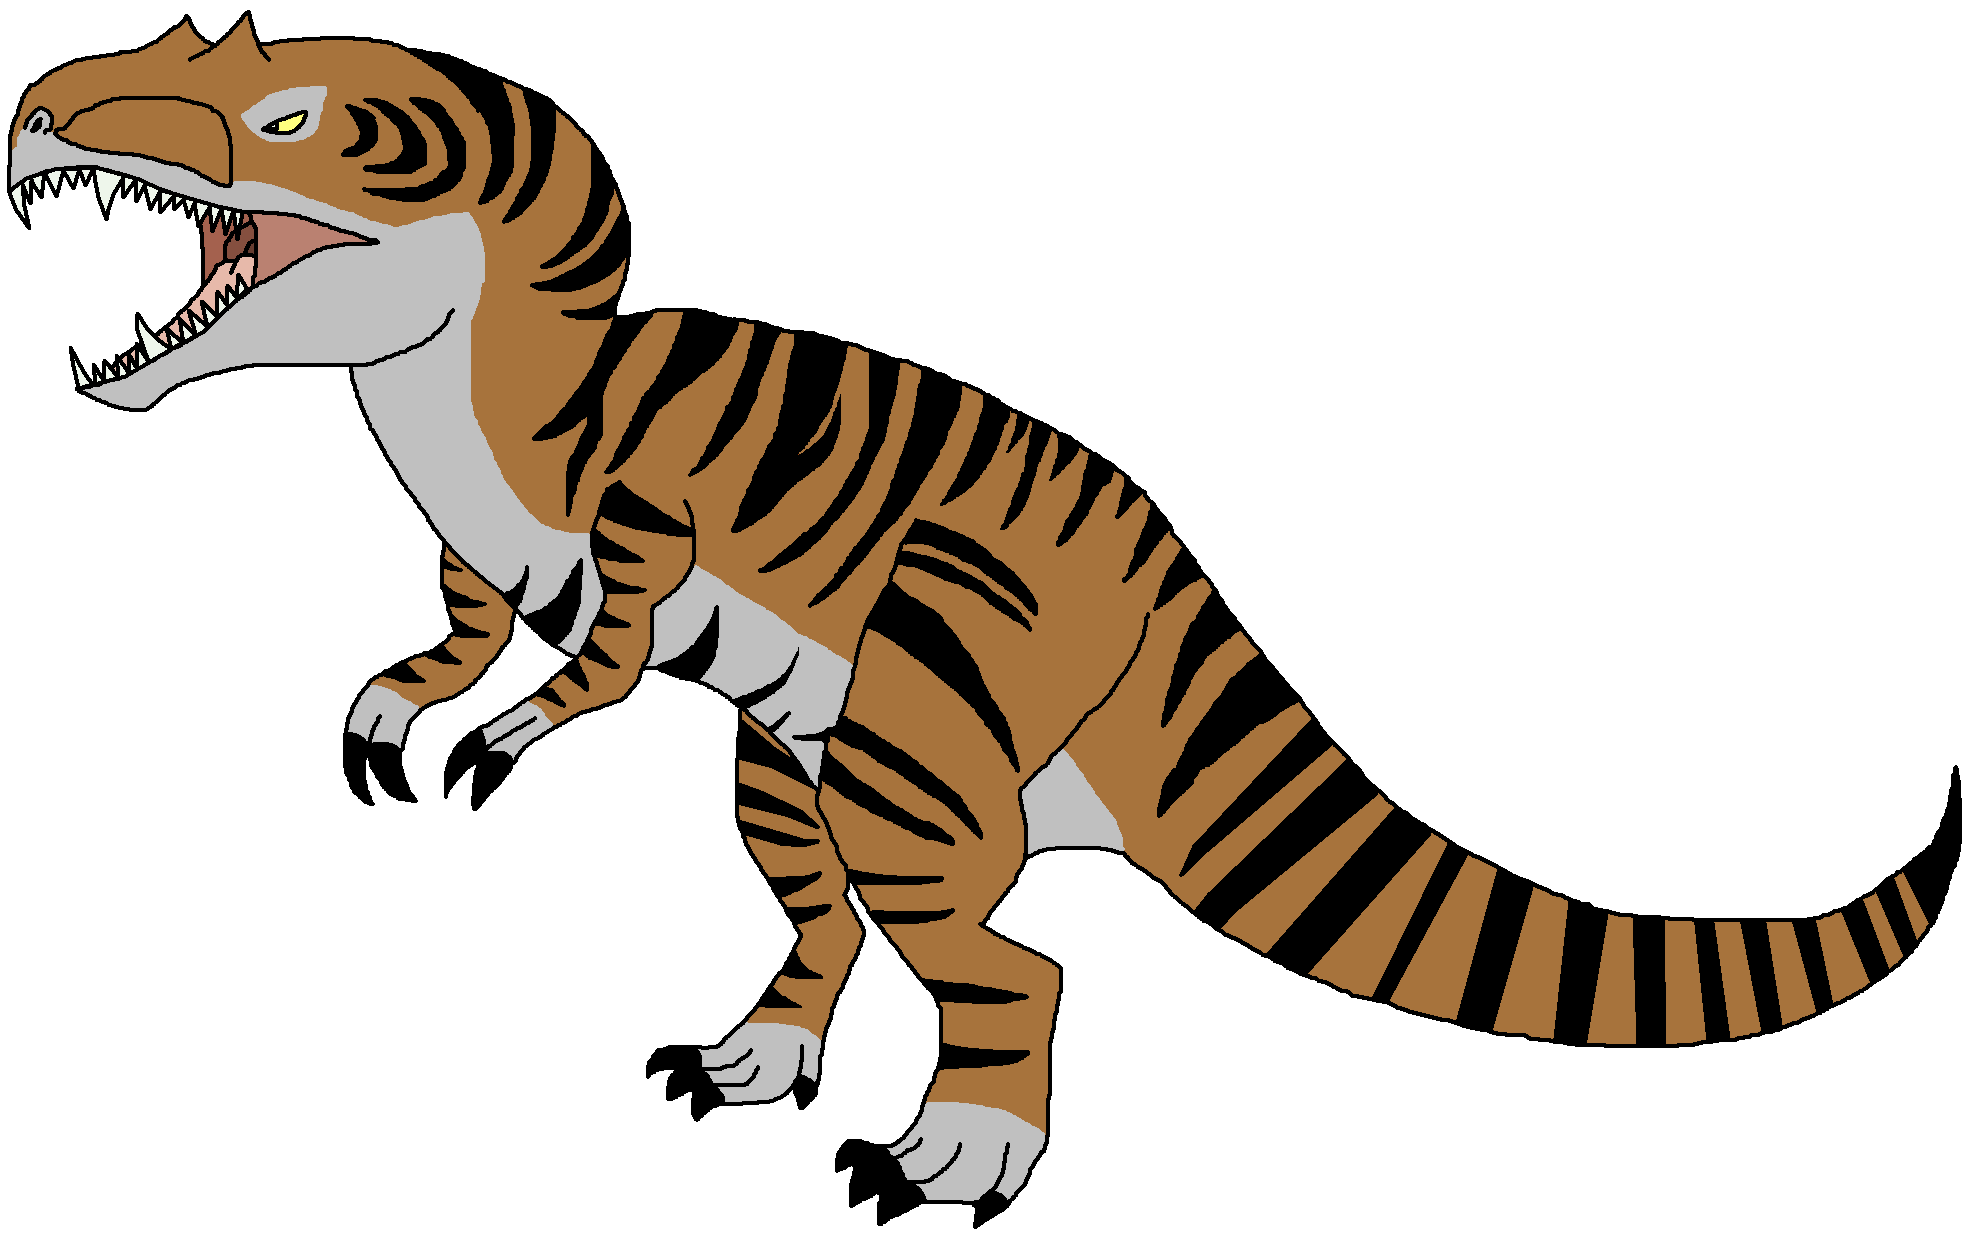 Dinosaur clipart megalosaurus. Metriacanthosaurus pedia wikia fandom